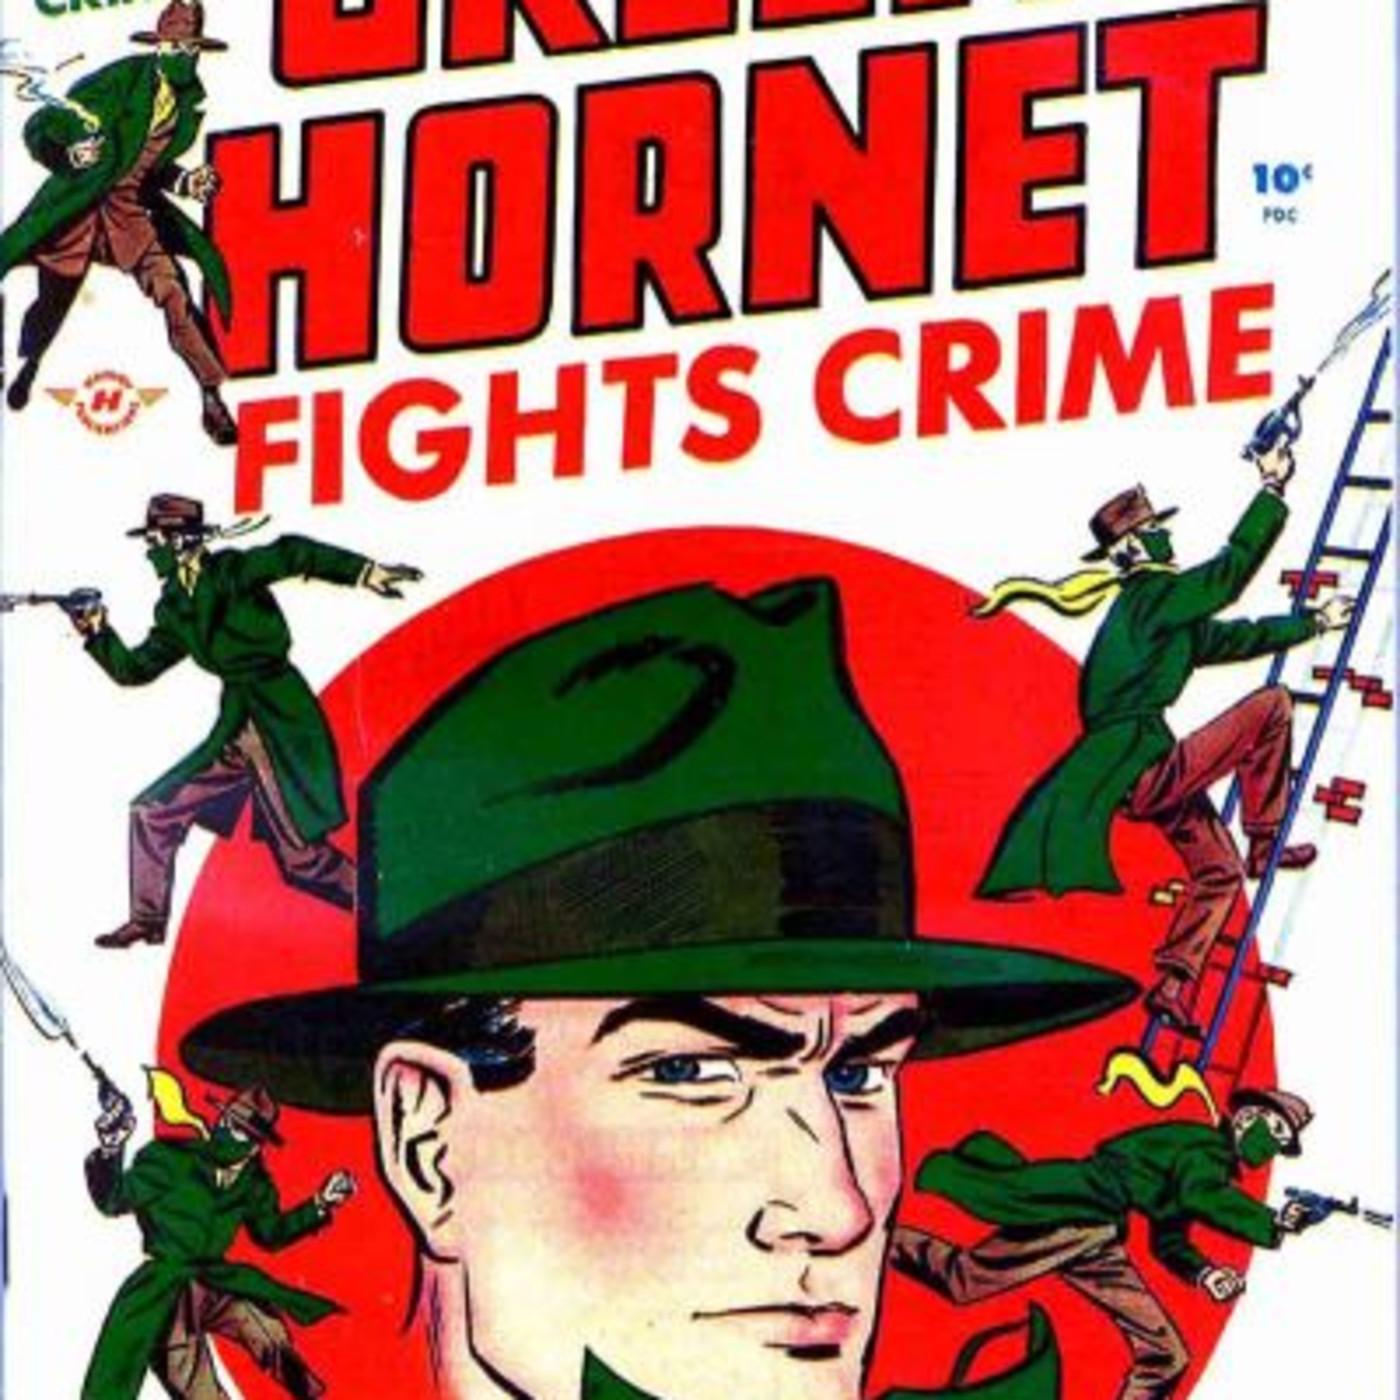 The Green Hornet - 00 - 421121 Sabotage Finds A Nam.mp